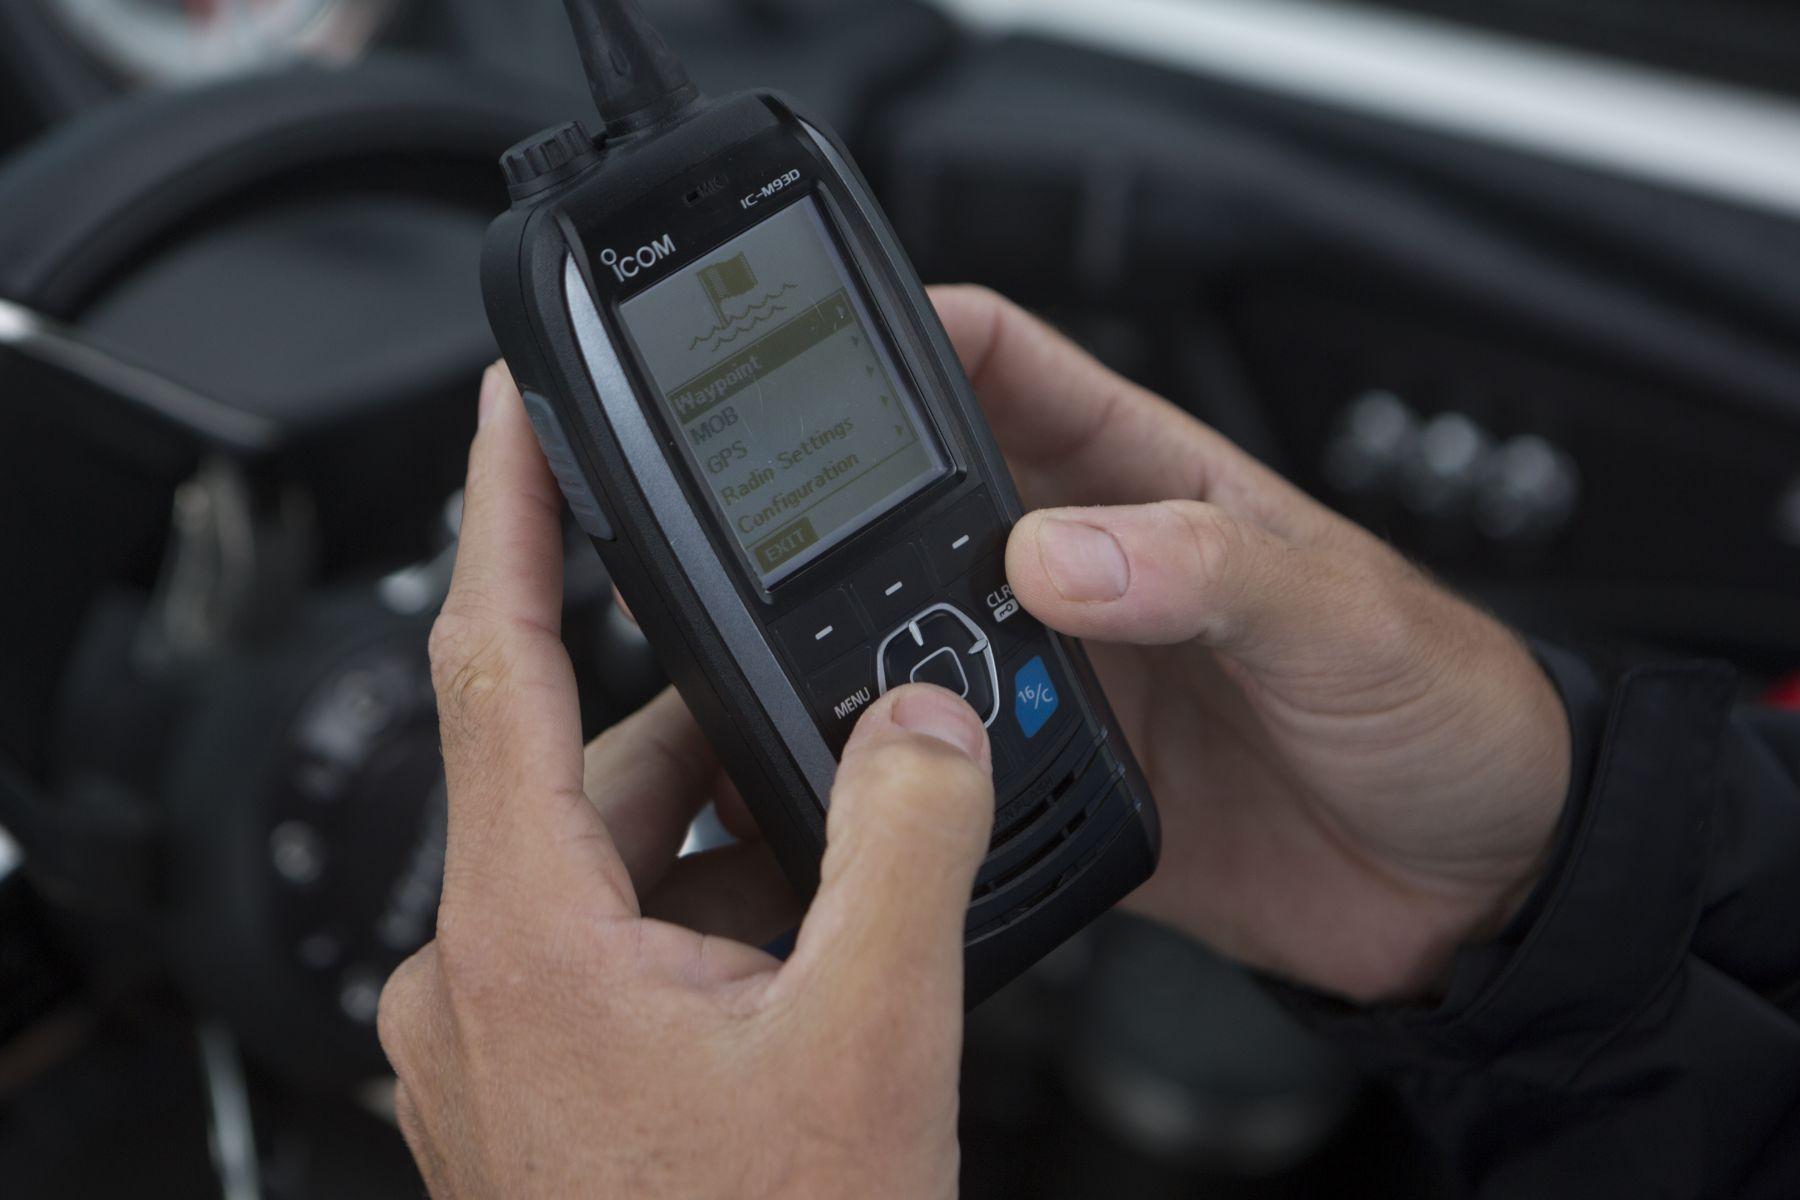 Using a handheld VHF-DSC marine band radio set to channel 16.